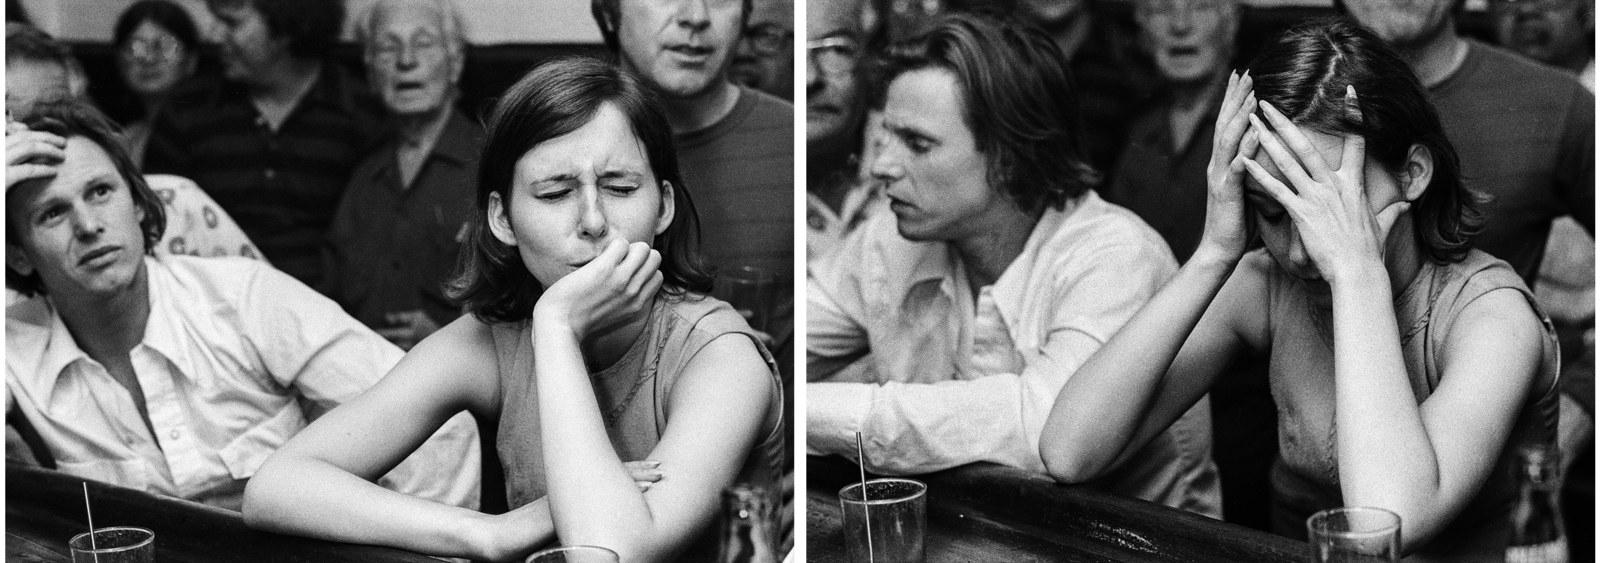 Patrons in a Philadelphia bar watch President Nixon's resignation speech.